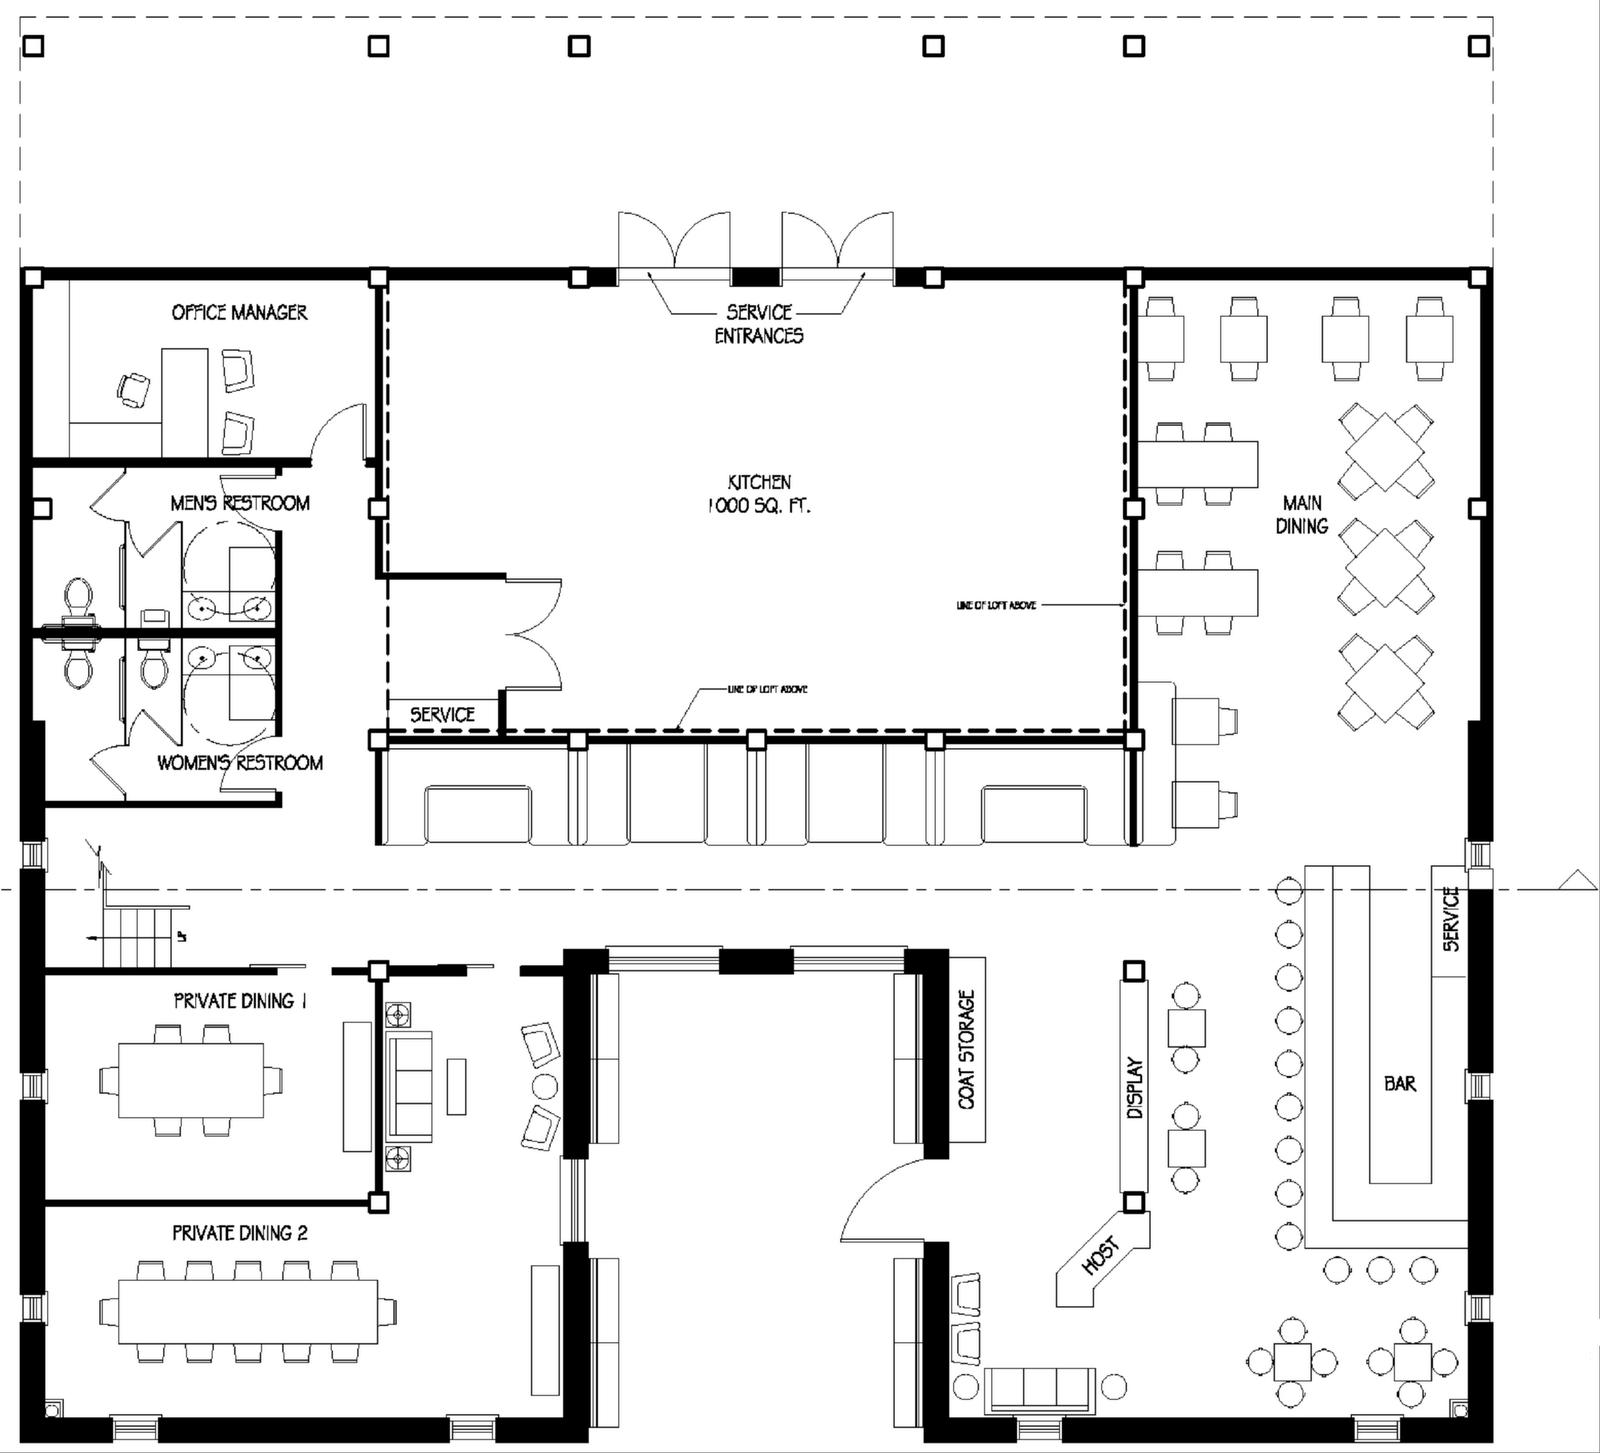 Restaurant Floor Plans  Restaurant Floor Plan  Store